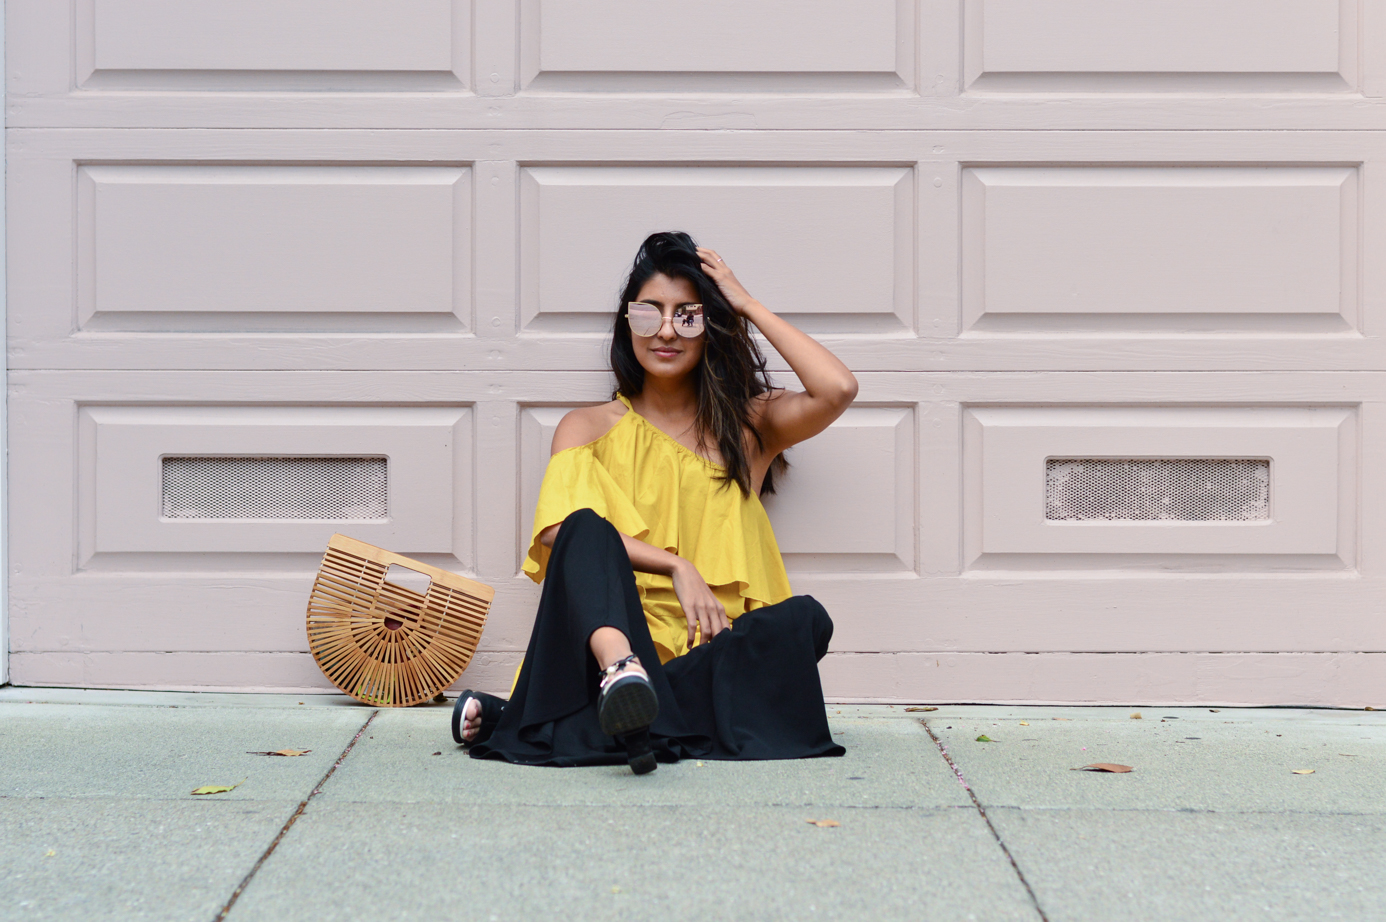 ruffles-mustard-yellow-fall-fashion-asymmetric-hem-blogger-outfit 4